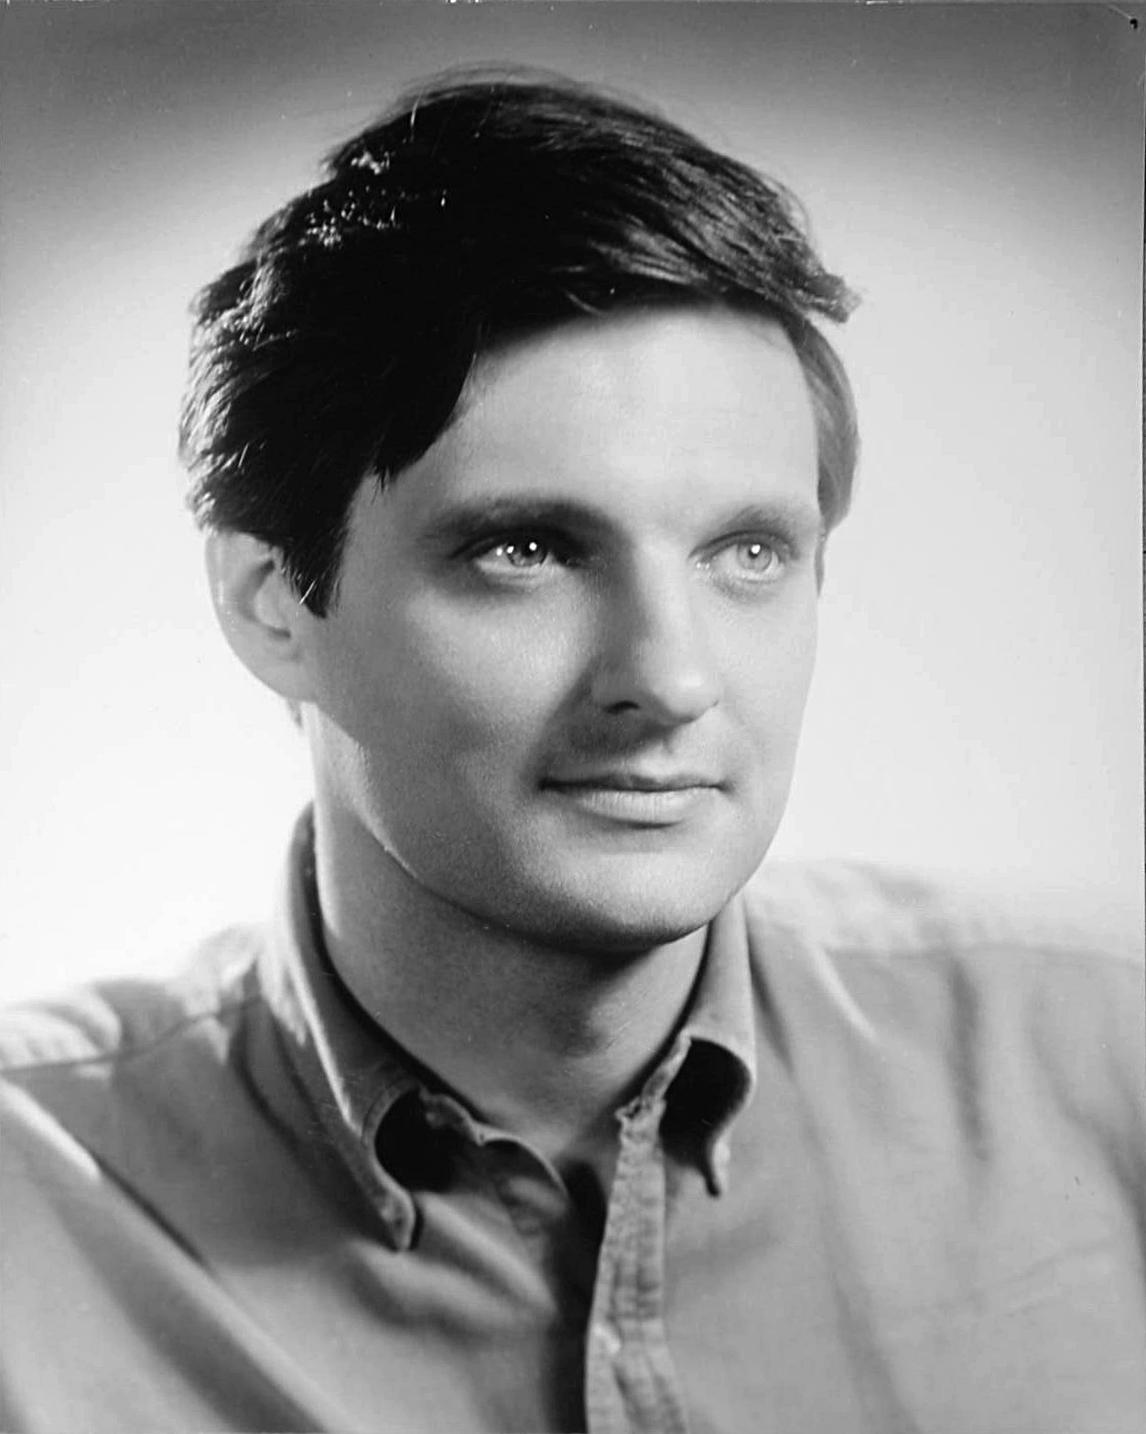 Alan Alda circa 1960s